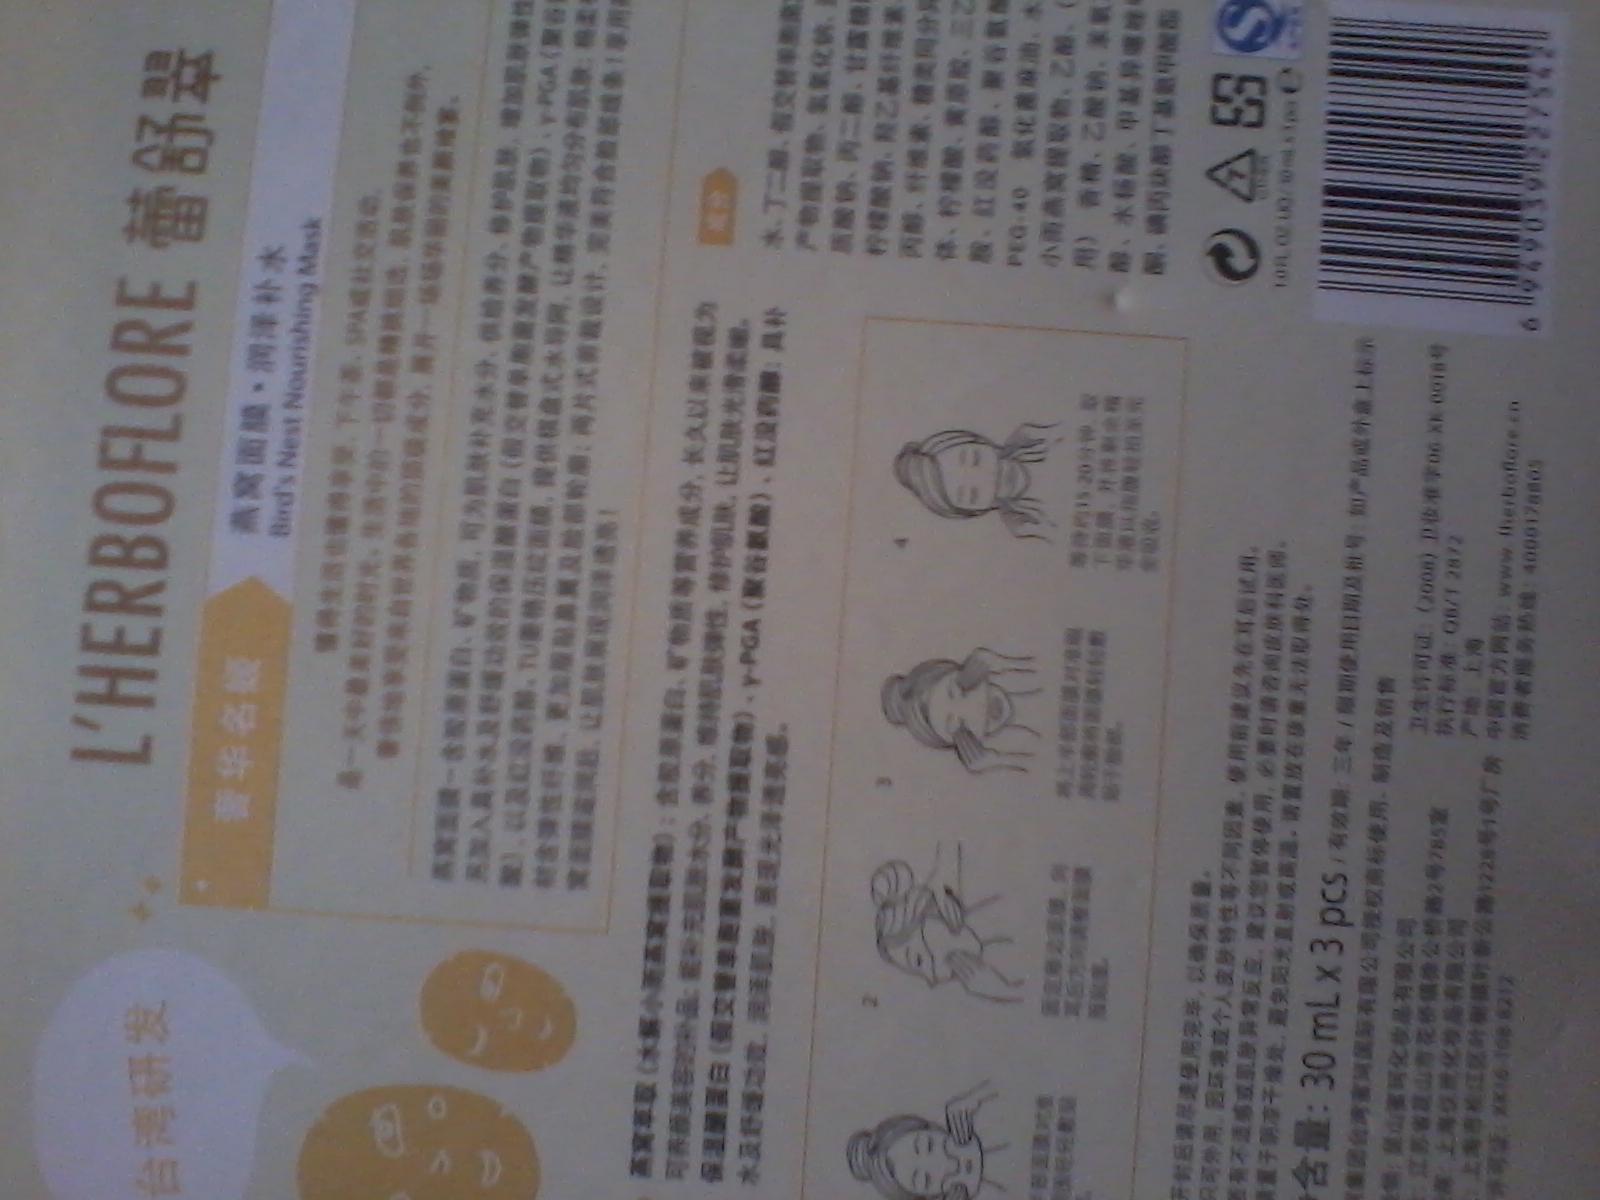 retro jordan 11 toddler 00244149 cheap